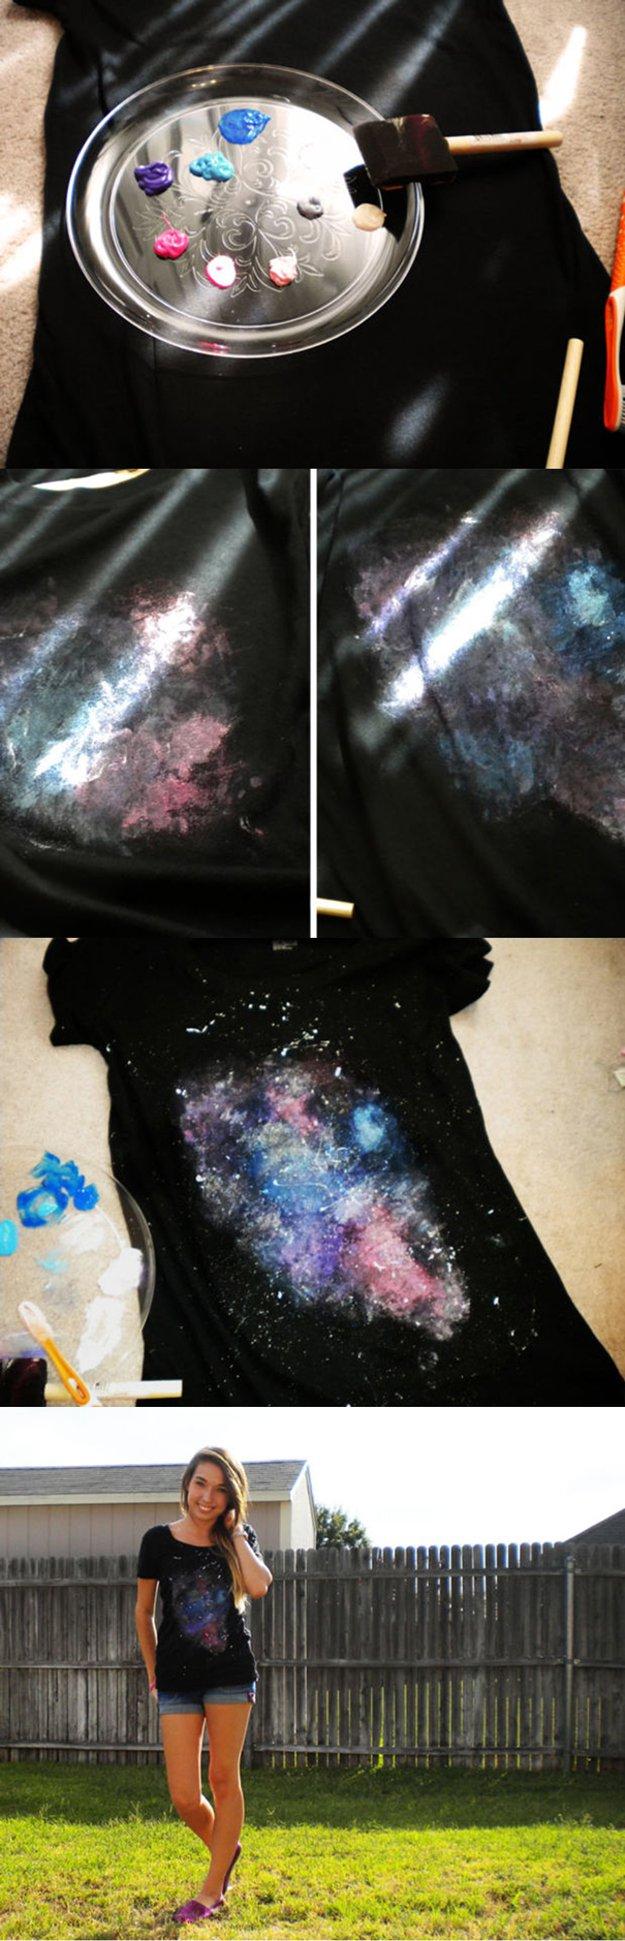 Cute Top Design Ideas for Teens | diyready.com/diy-clothes-sewing-blouses-tutorial/